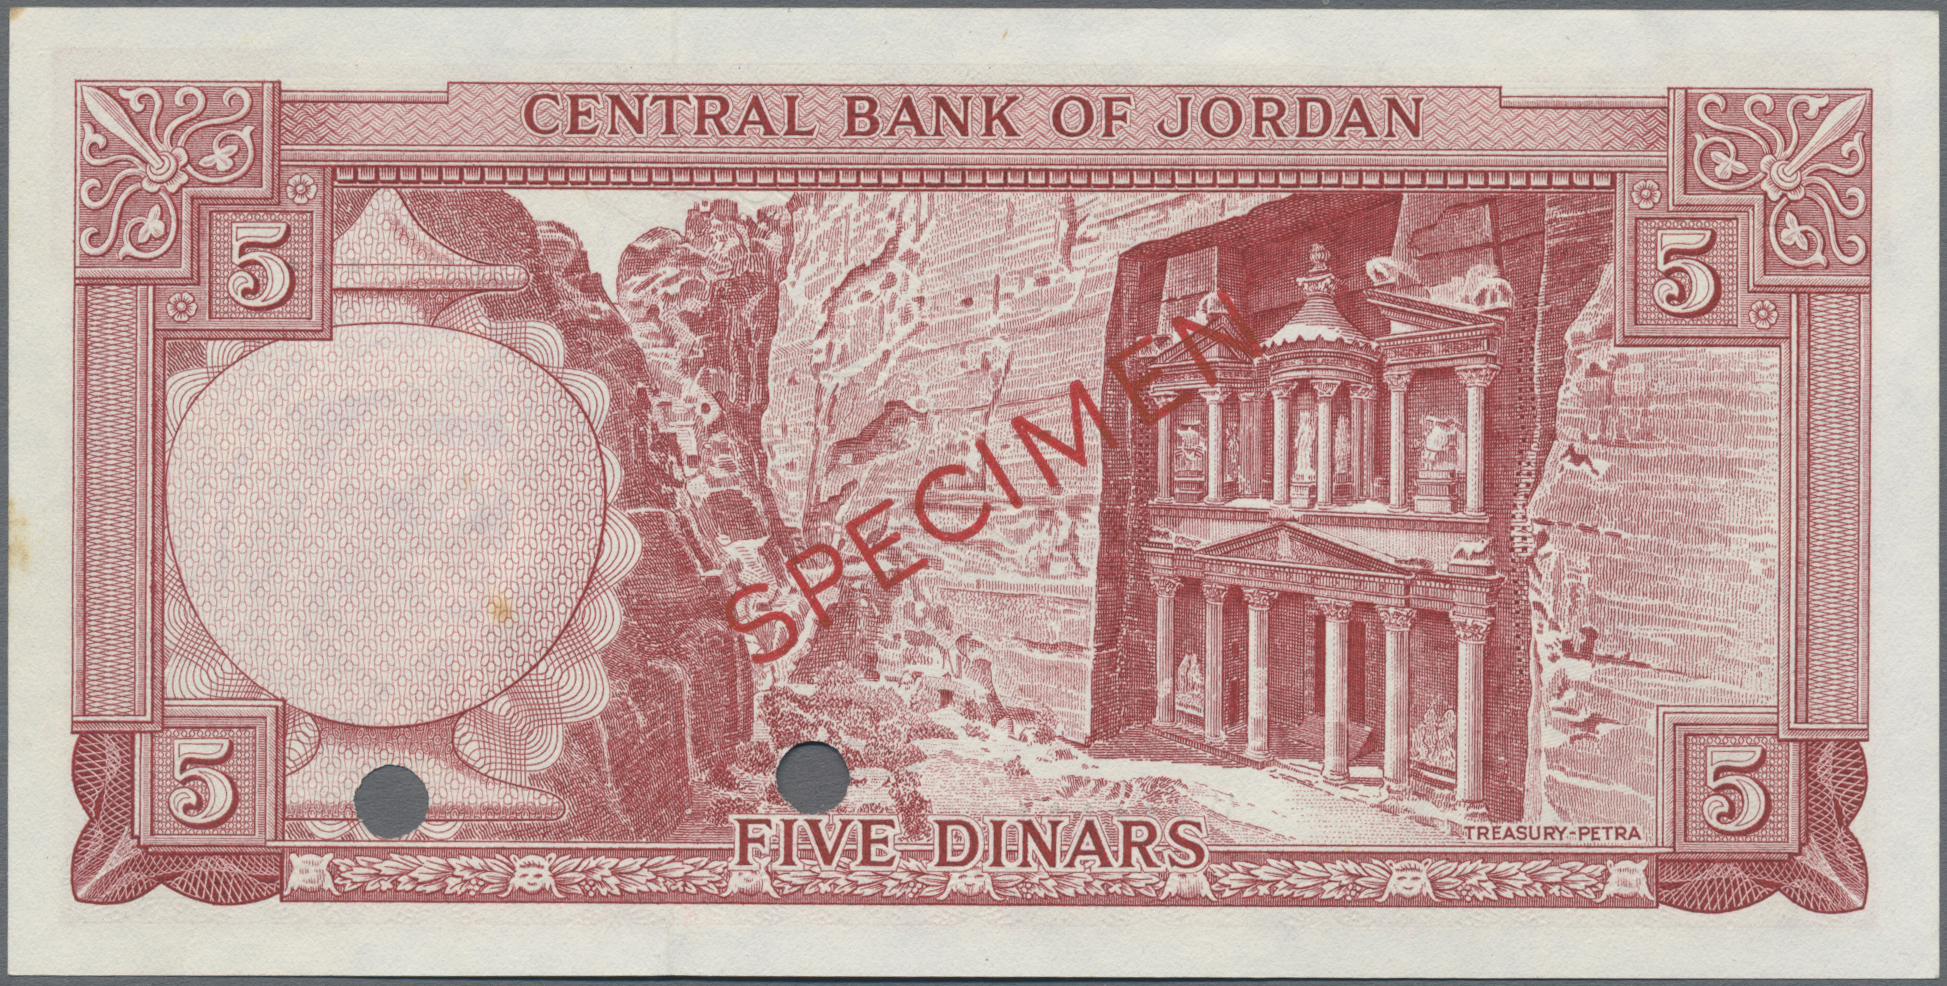 Lot 00484 - Jordan / Jordanien | Banknoten  -  Auktionshaus Christoph Gärtner GmbH & Co. KG Sale #48 The Banknotes